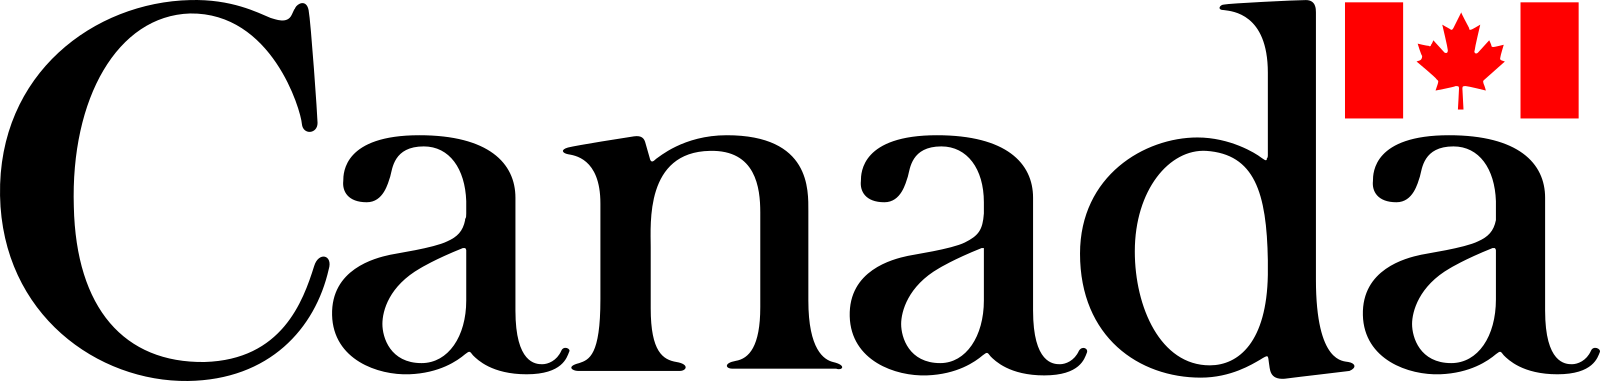 canada logo 2 - Canada Logo